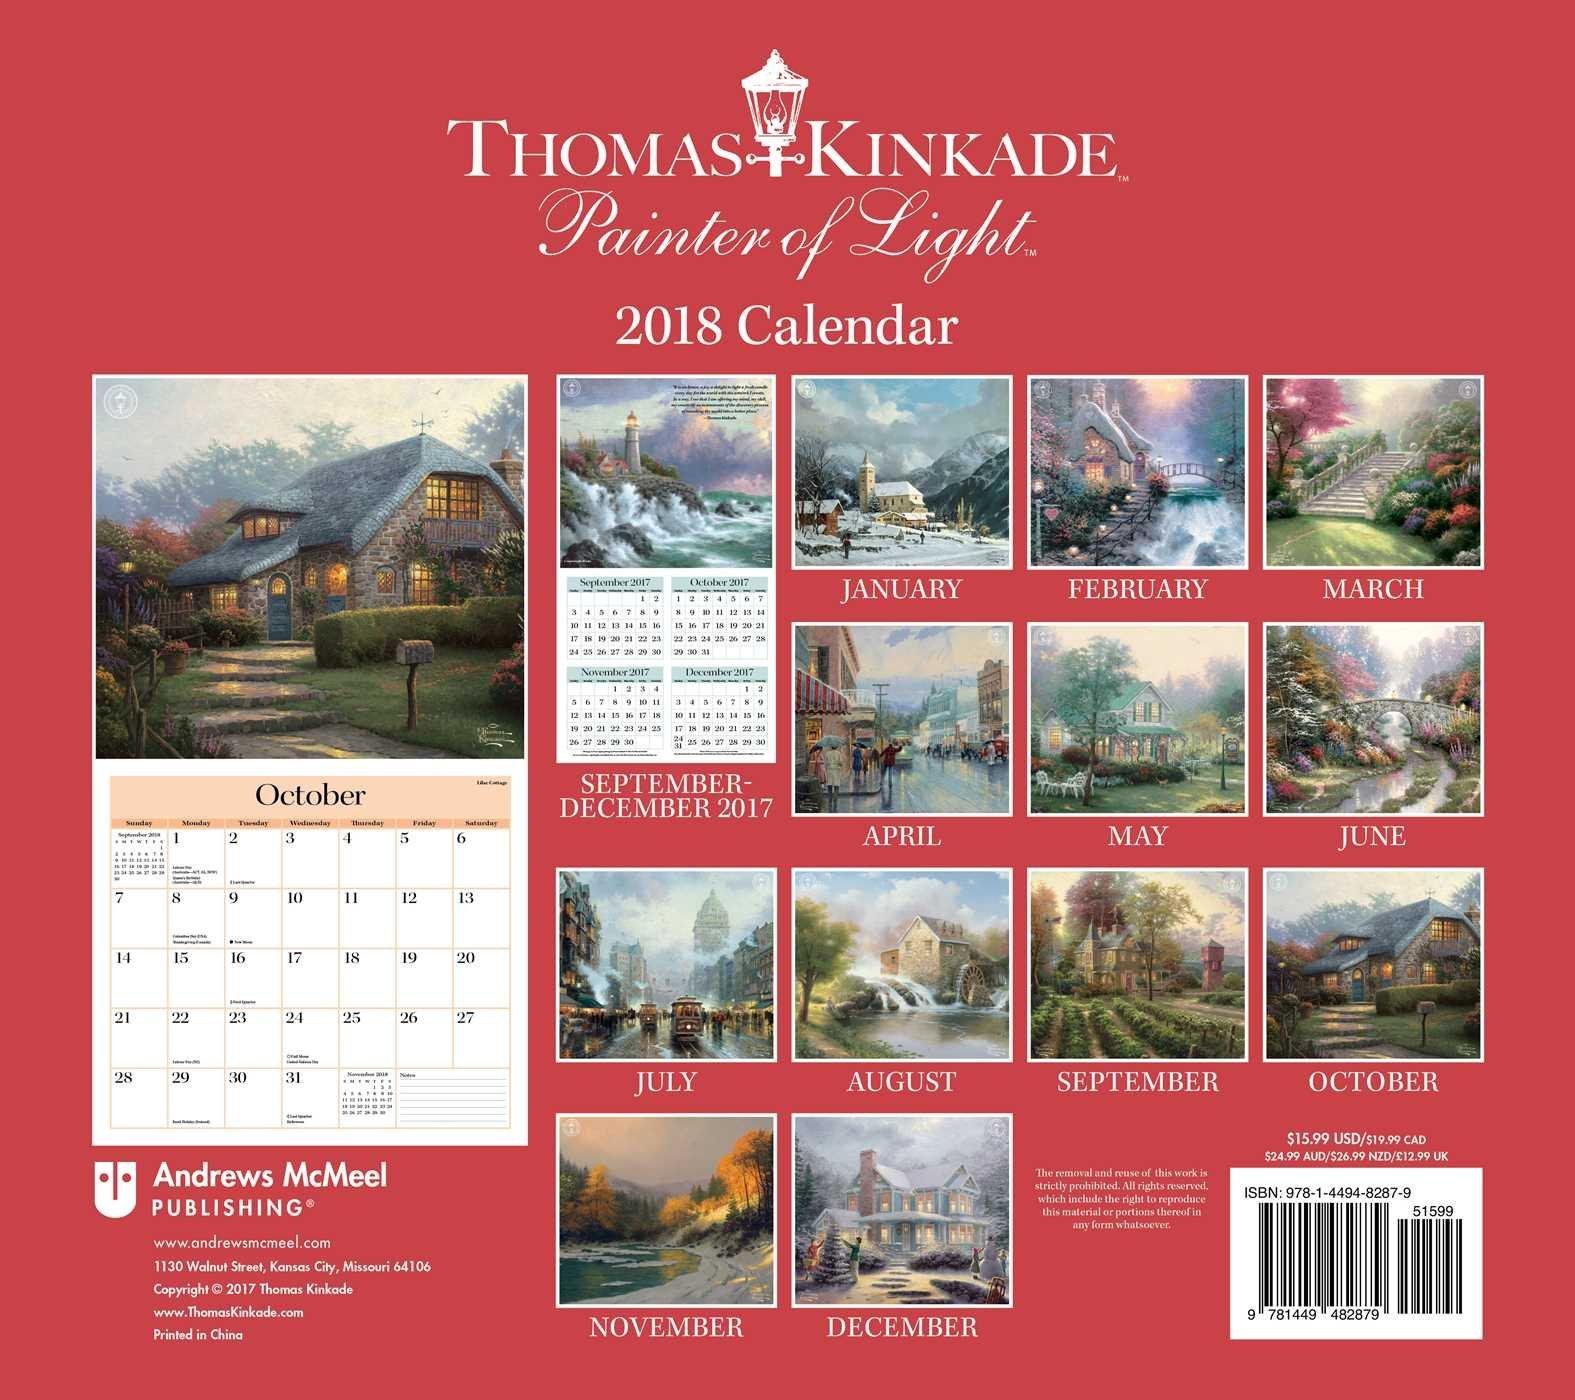 Official Thomas Kinkade Painter Of Light 2018 Deluxe Wall Calendar Calendar 2019 Thomas Kinkade